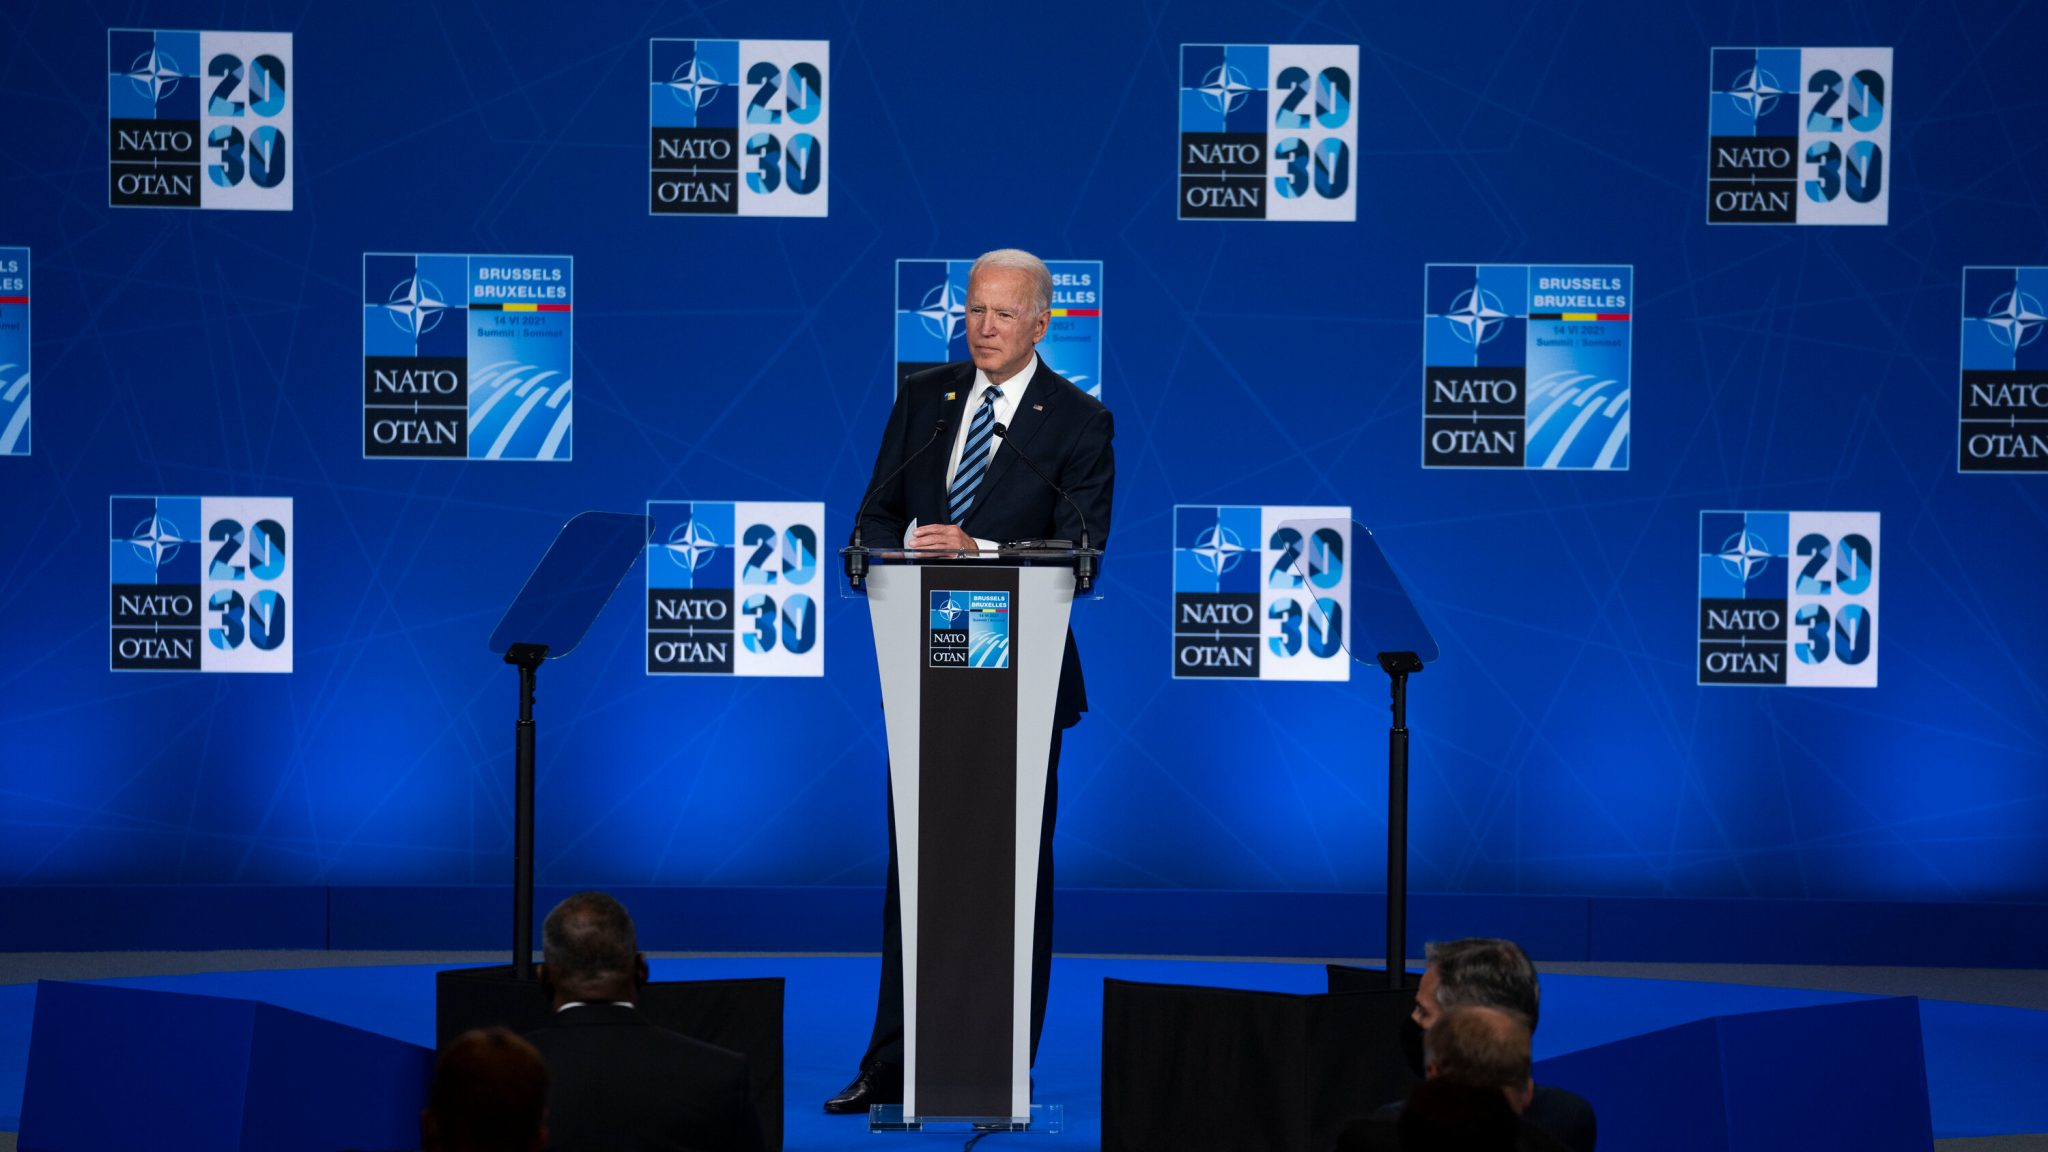 2021 NATO Summit Held in Brussels, Belgium | 2021 NATO உச்சி மாநாடு பெல்ஜியத்தின் பிரஸ்ஸல்ஸில் நடைபெற்றது |_40.1